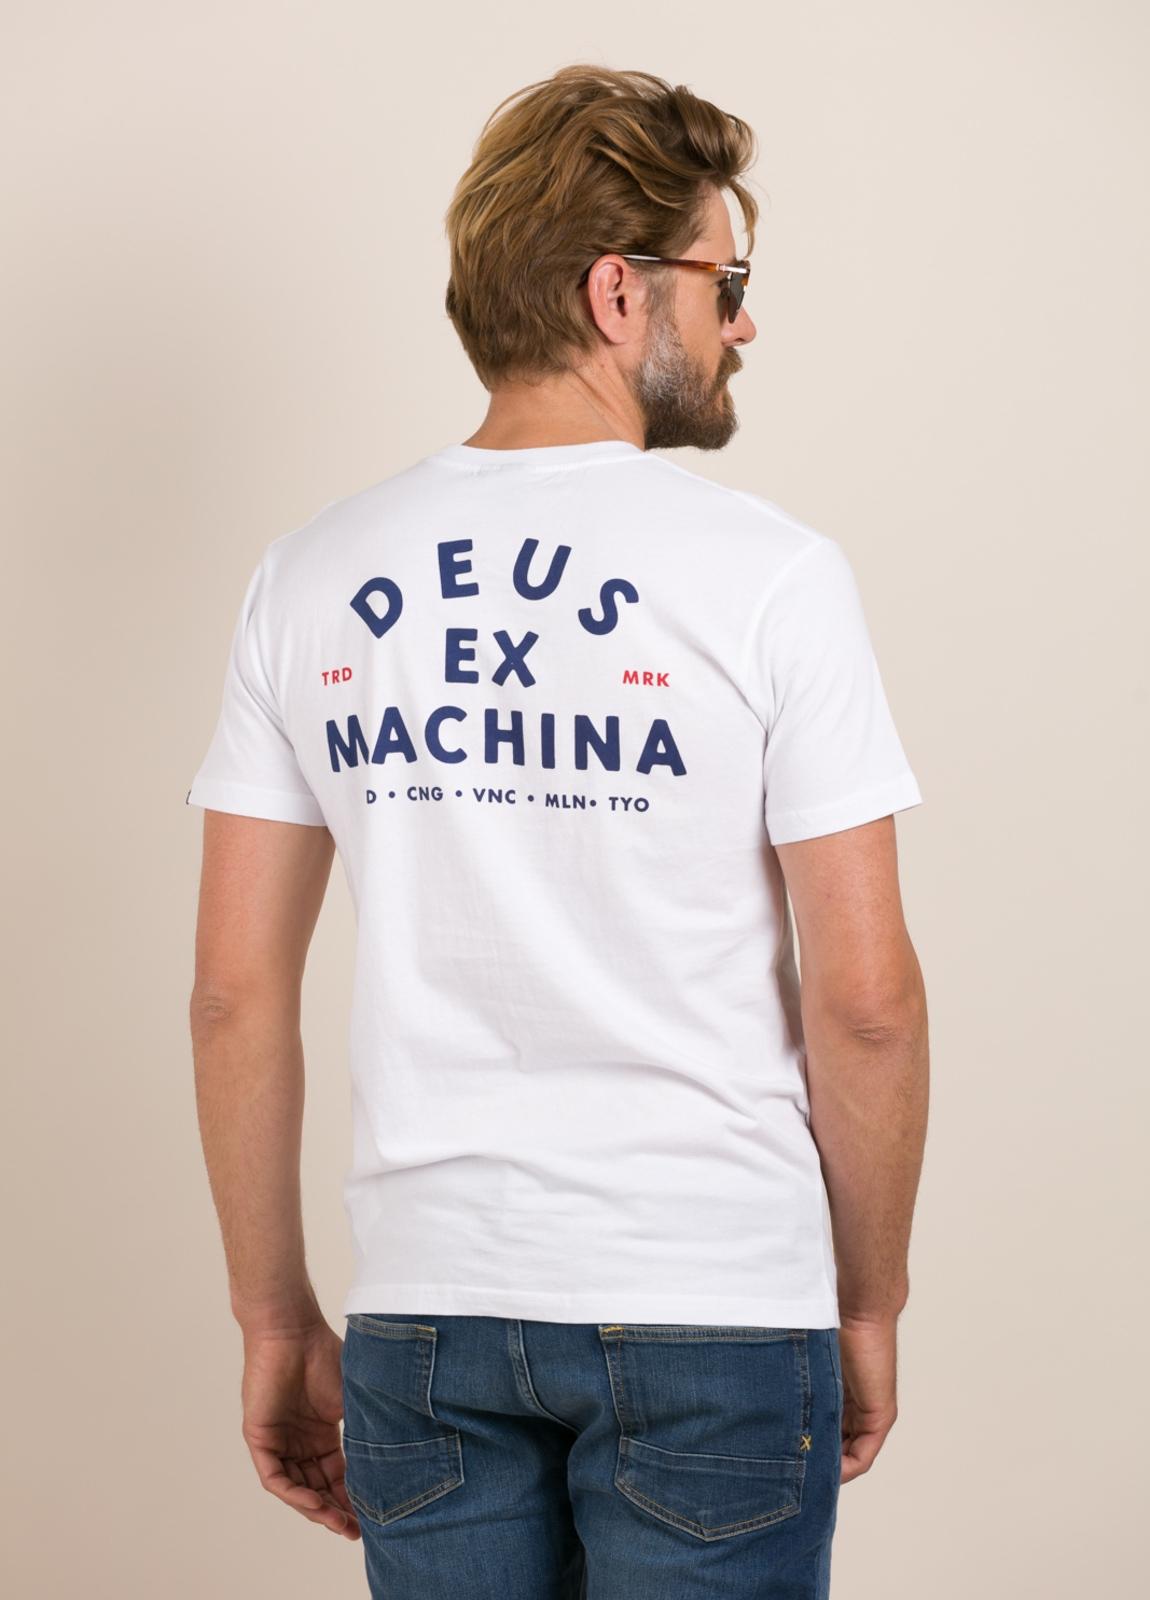 Camiseta DEUS blanco - Ítem1